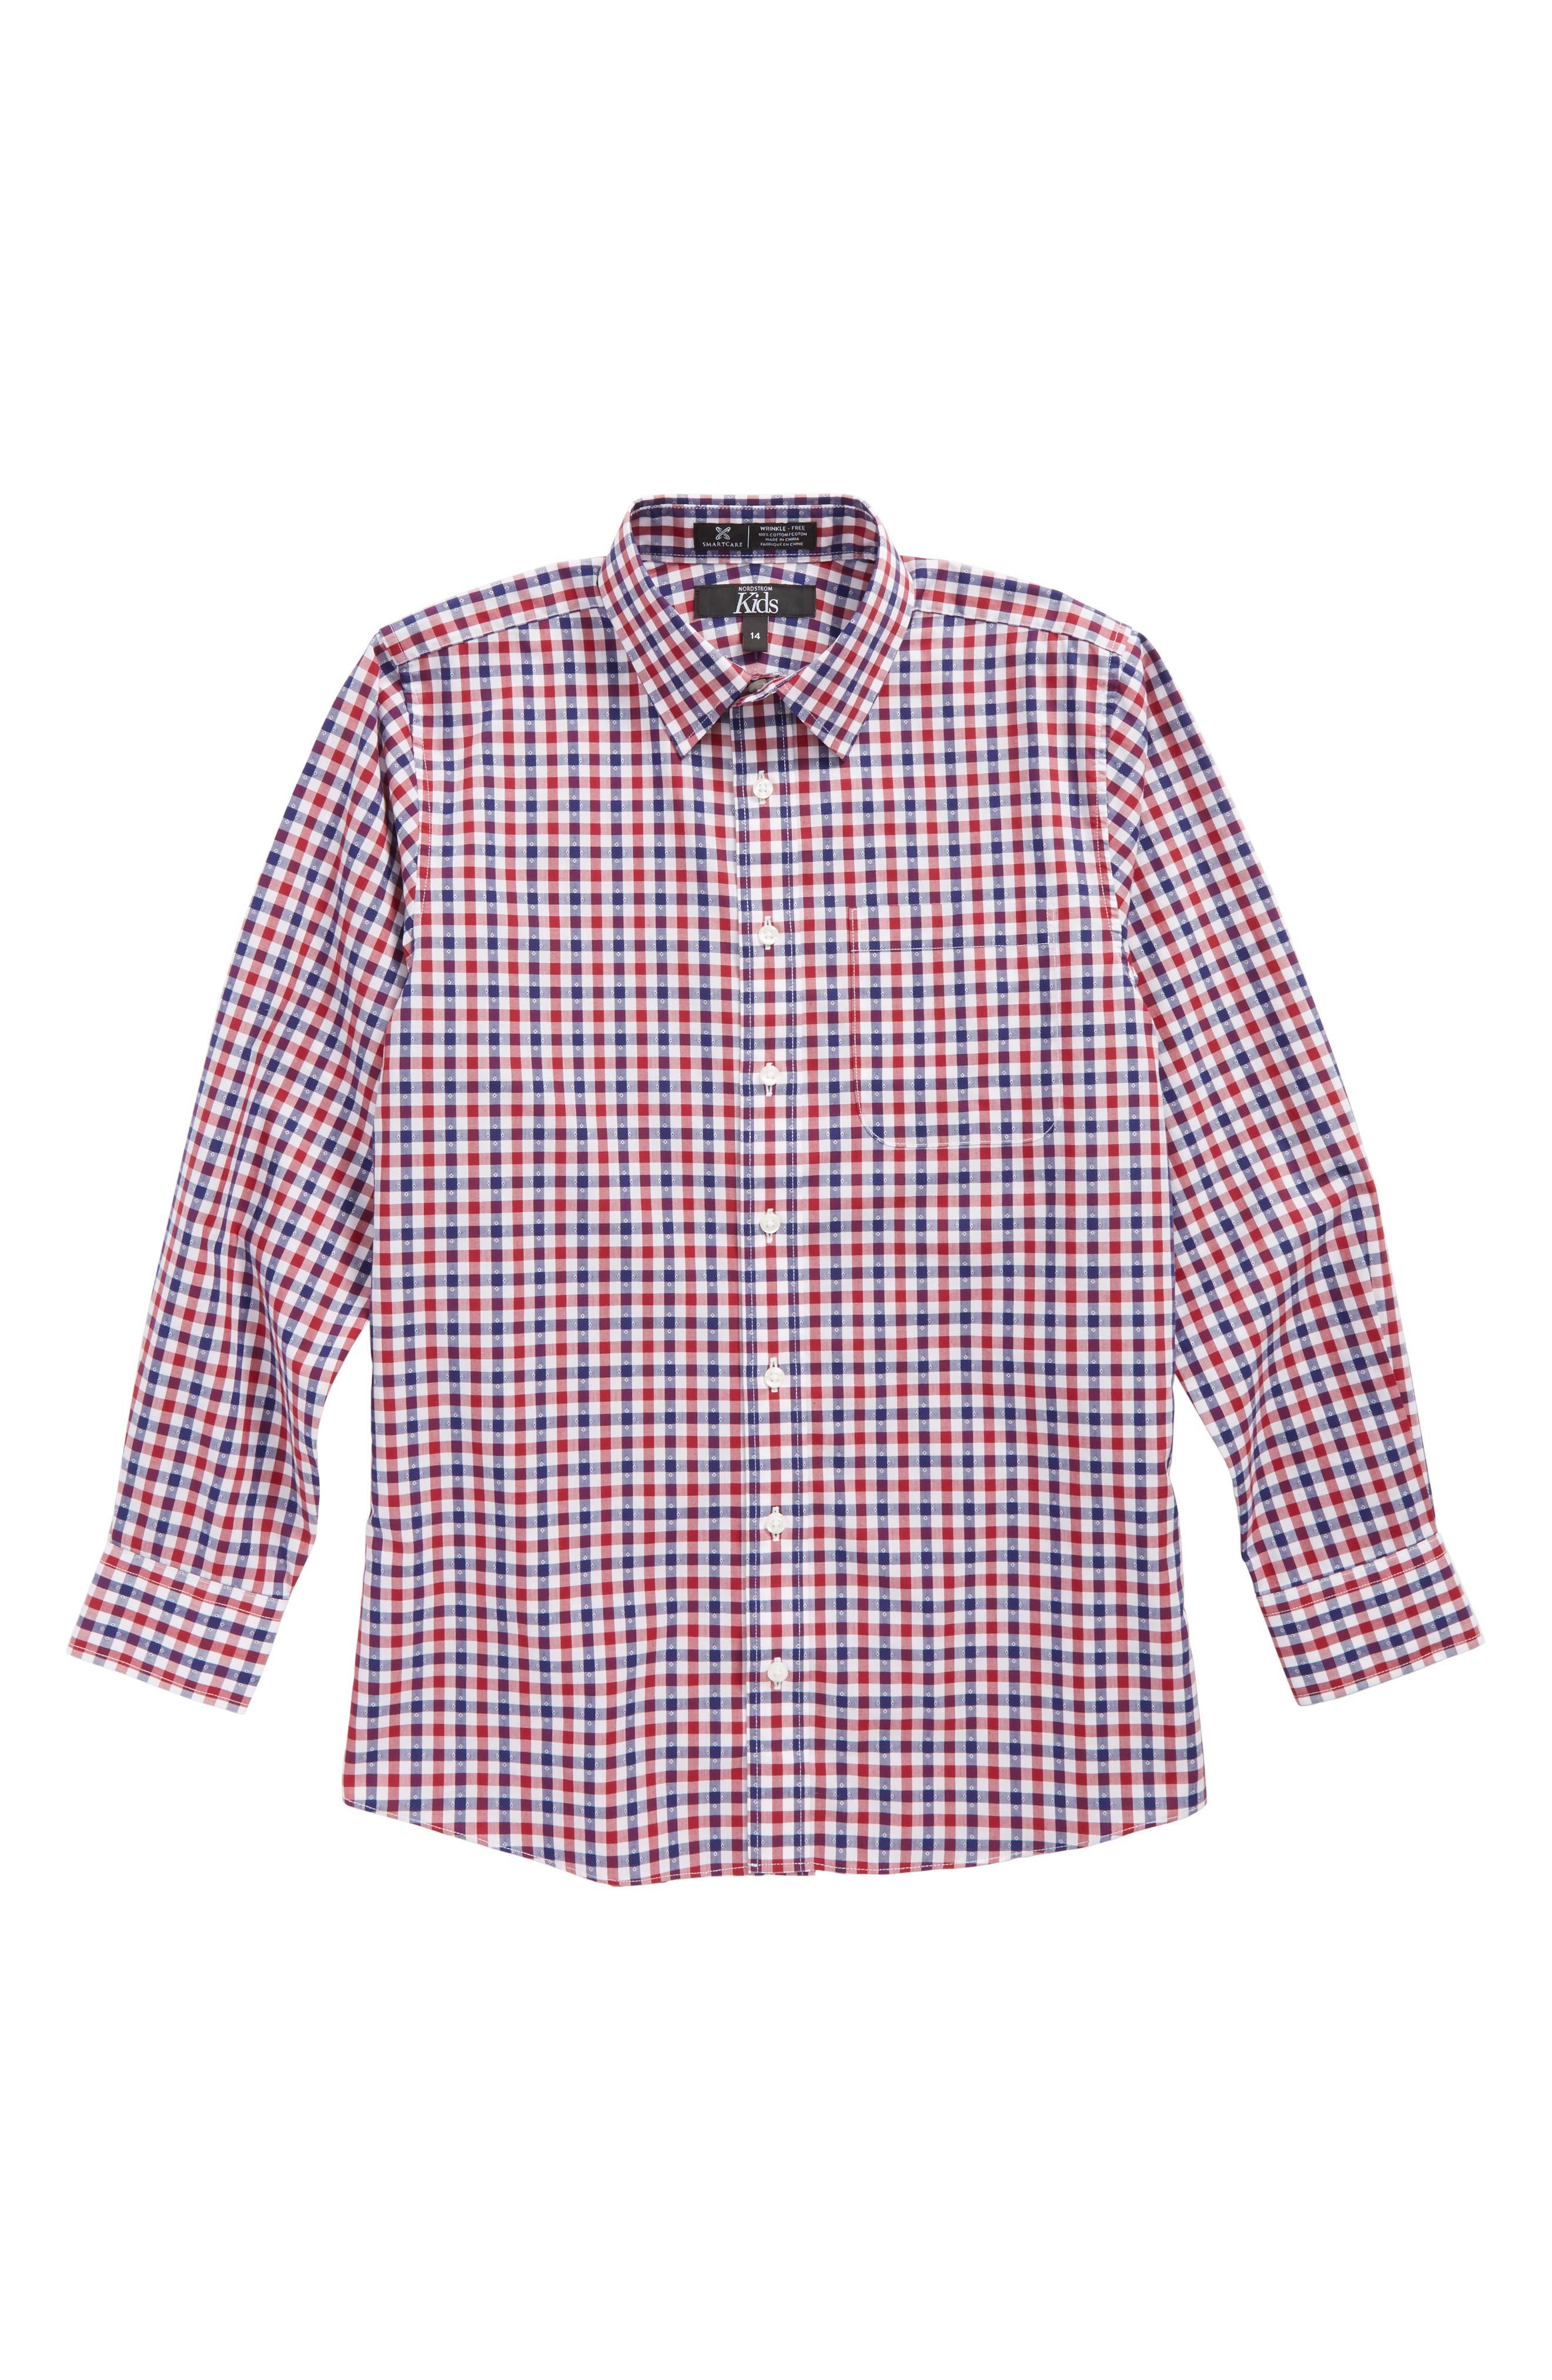 Alternate Image 1 Selected - Nordstrom Dot Gingham Sport Shirt (Big Boys)